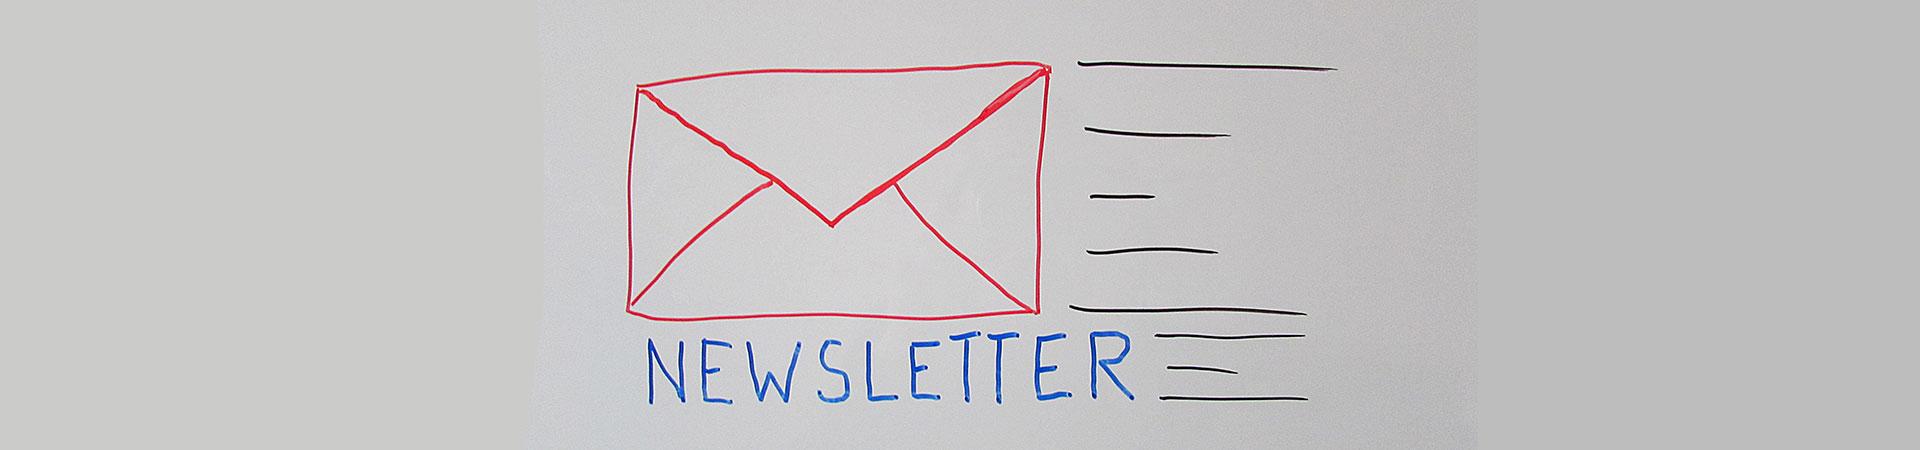 Cinco pasos para desarrollar un Newsletter en HTML